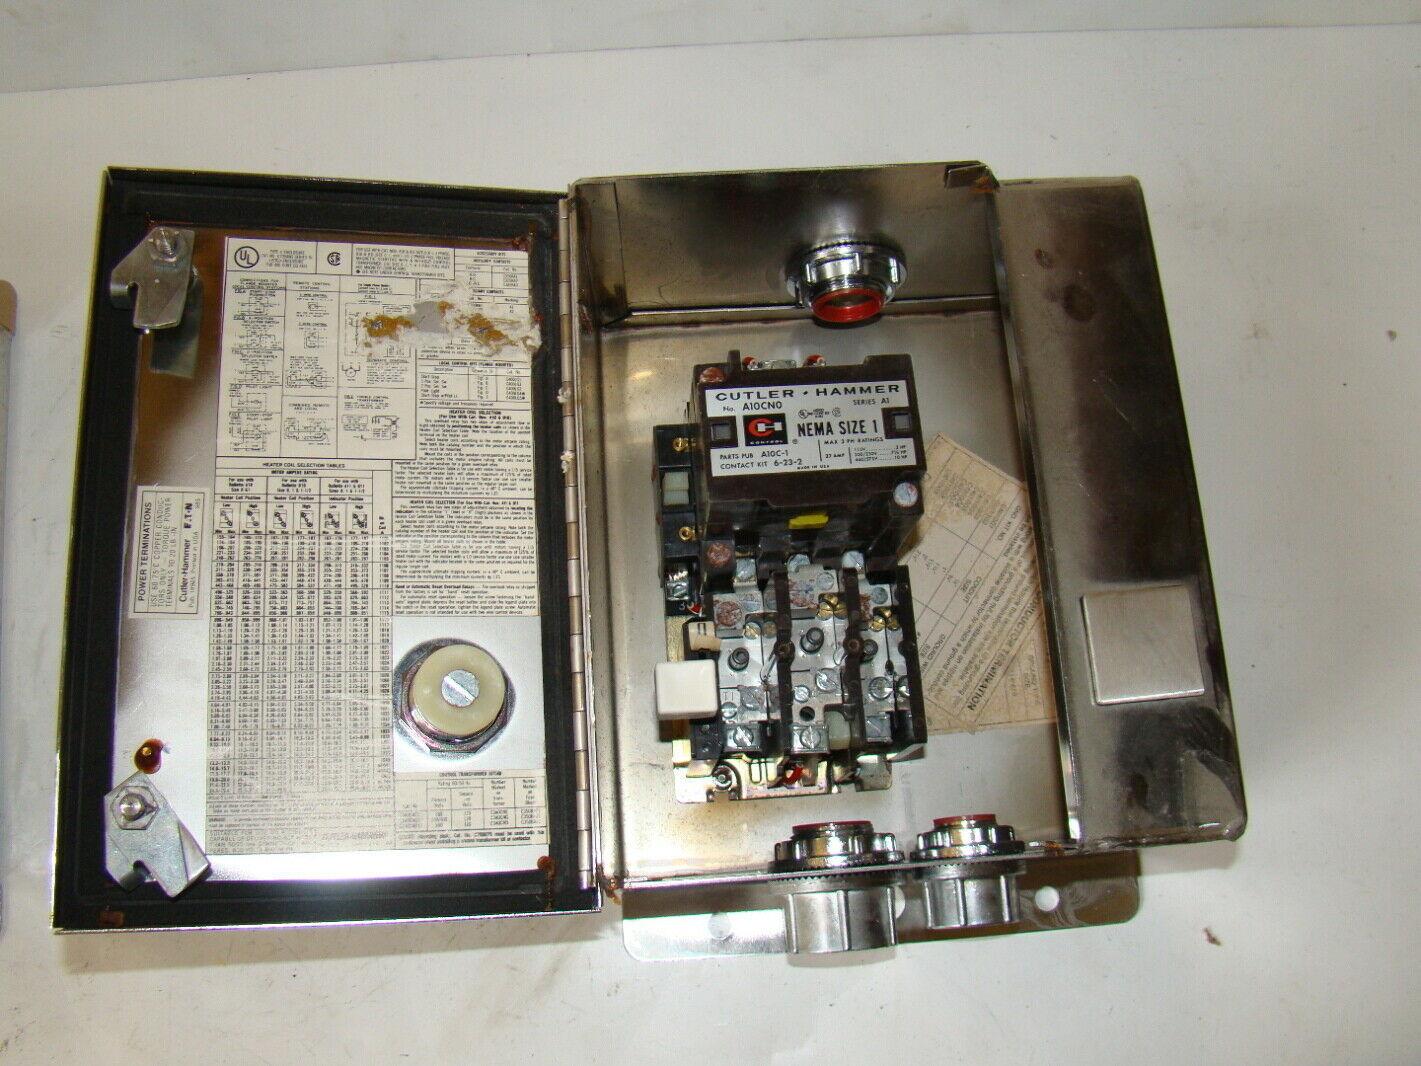 A10cg0 Cutler Hammer Starter Wiring Diagram Schematic Diagrams Nema Size 1 Motor Free Download U2022 Oasis Dl Co